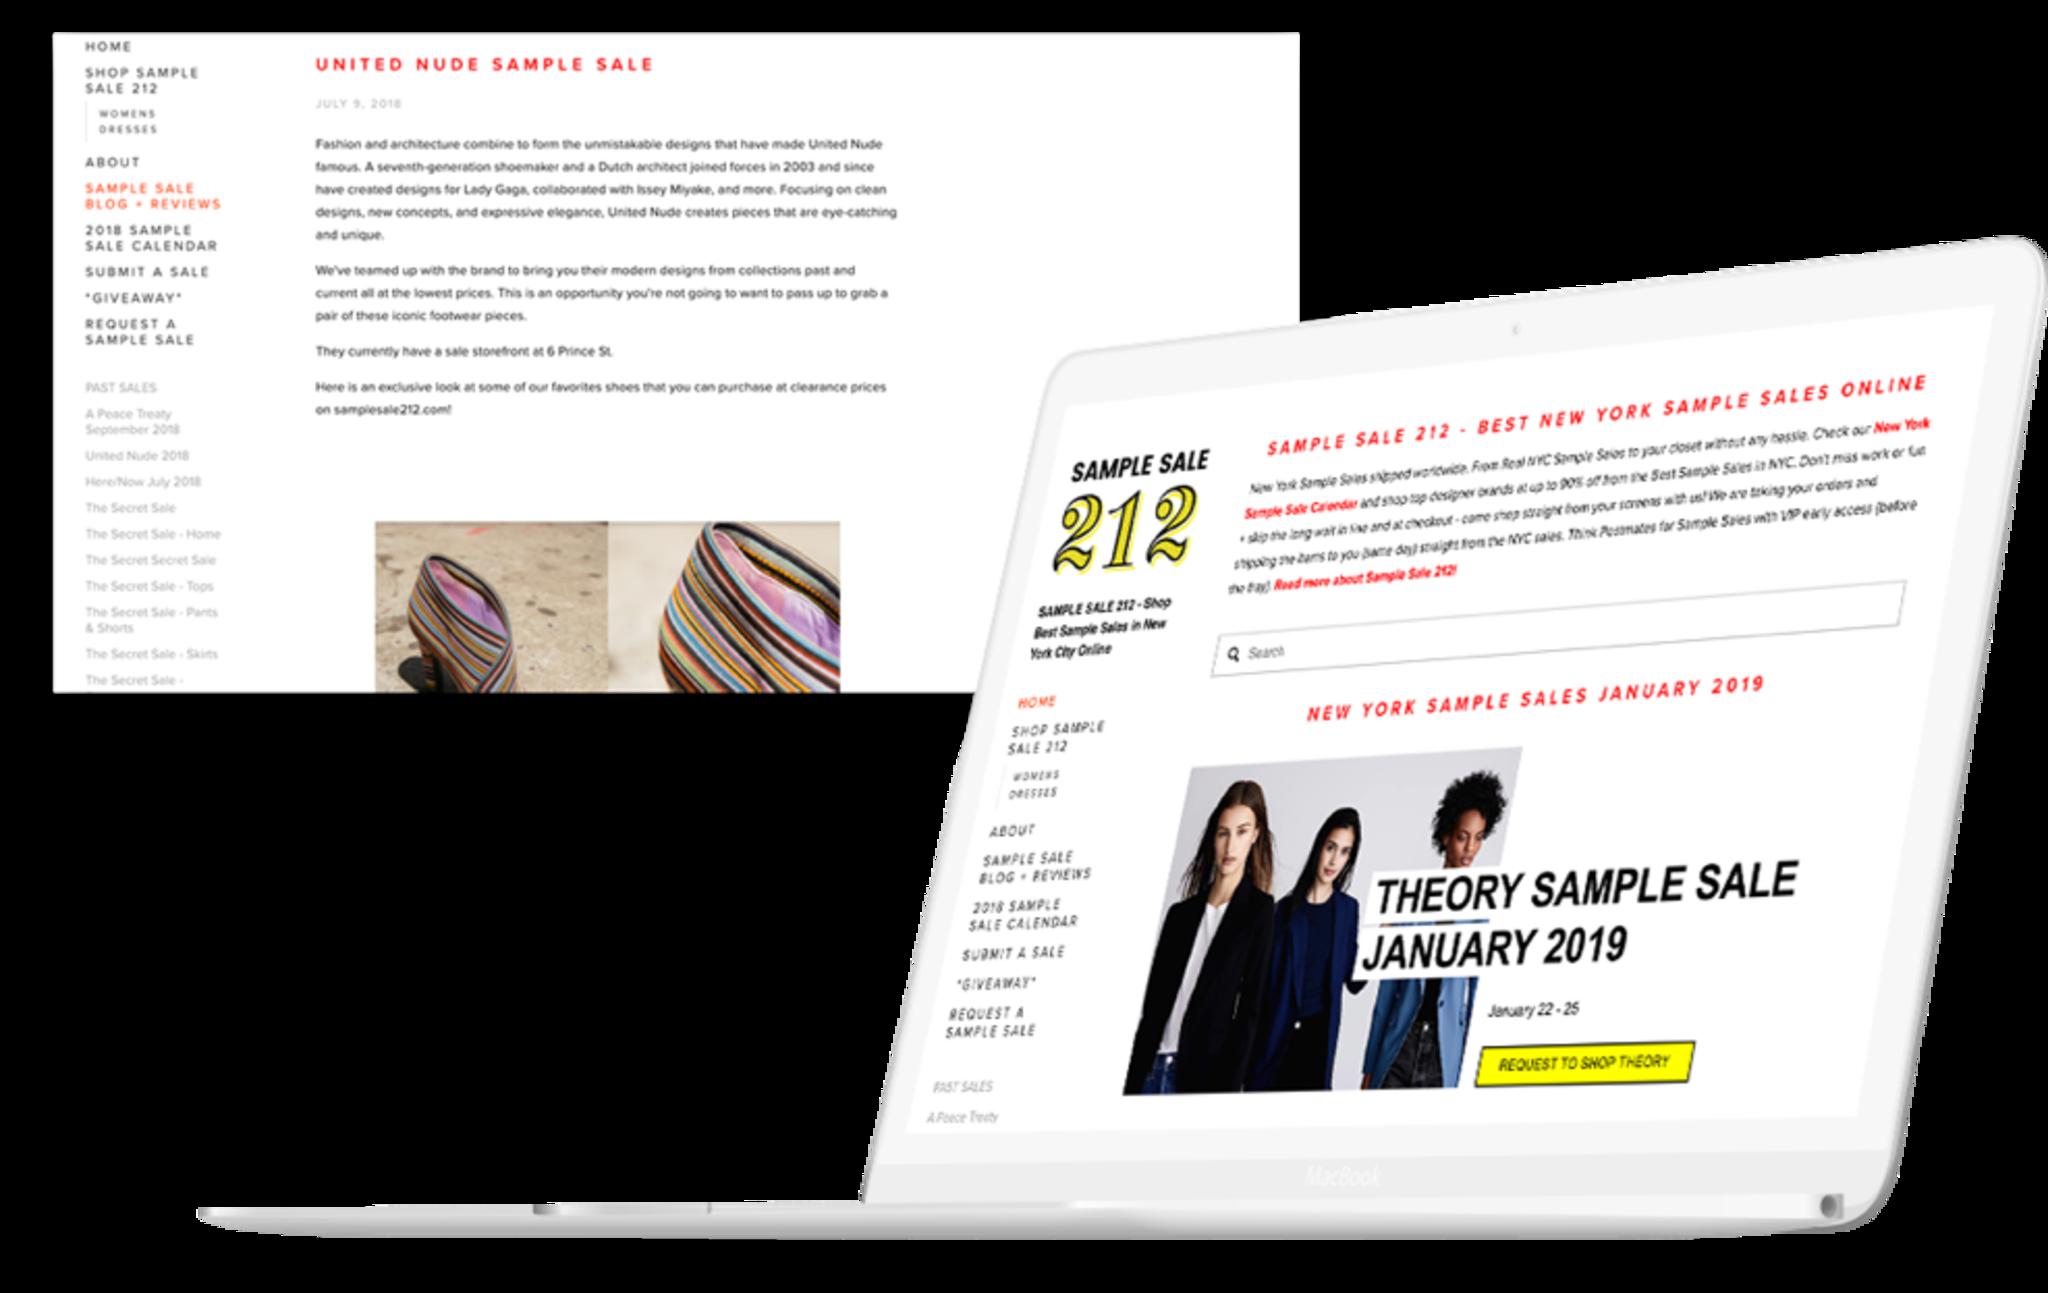 Sample Sale 212 - Development